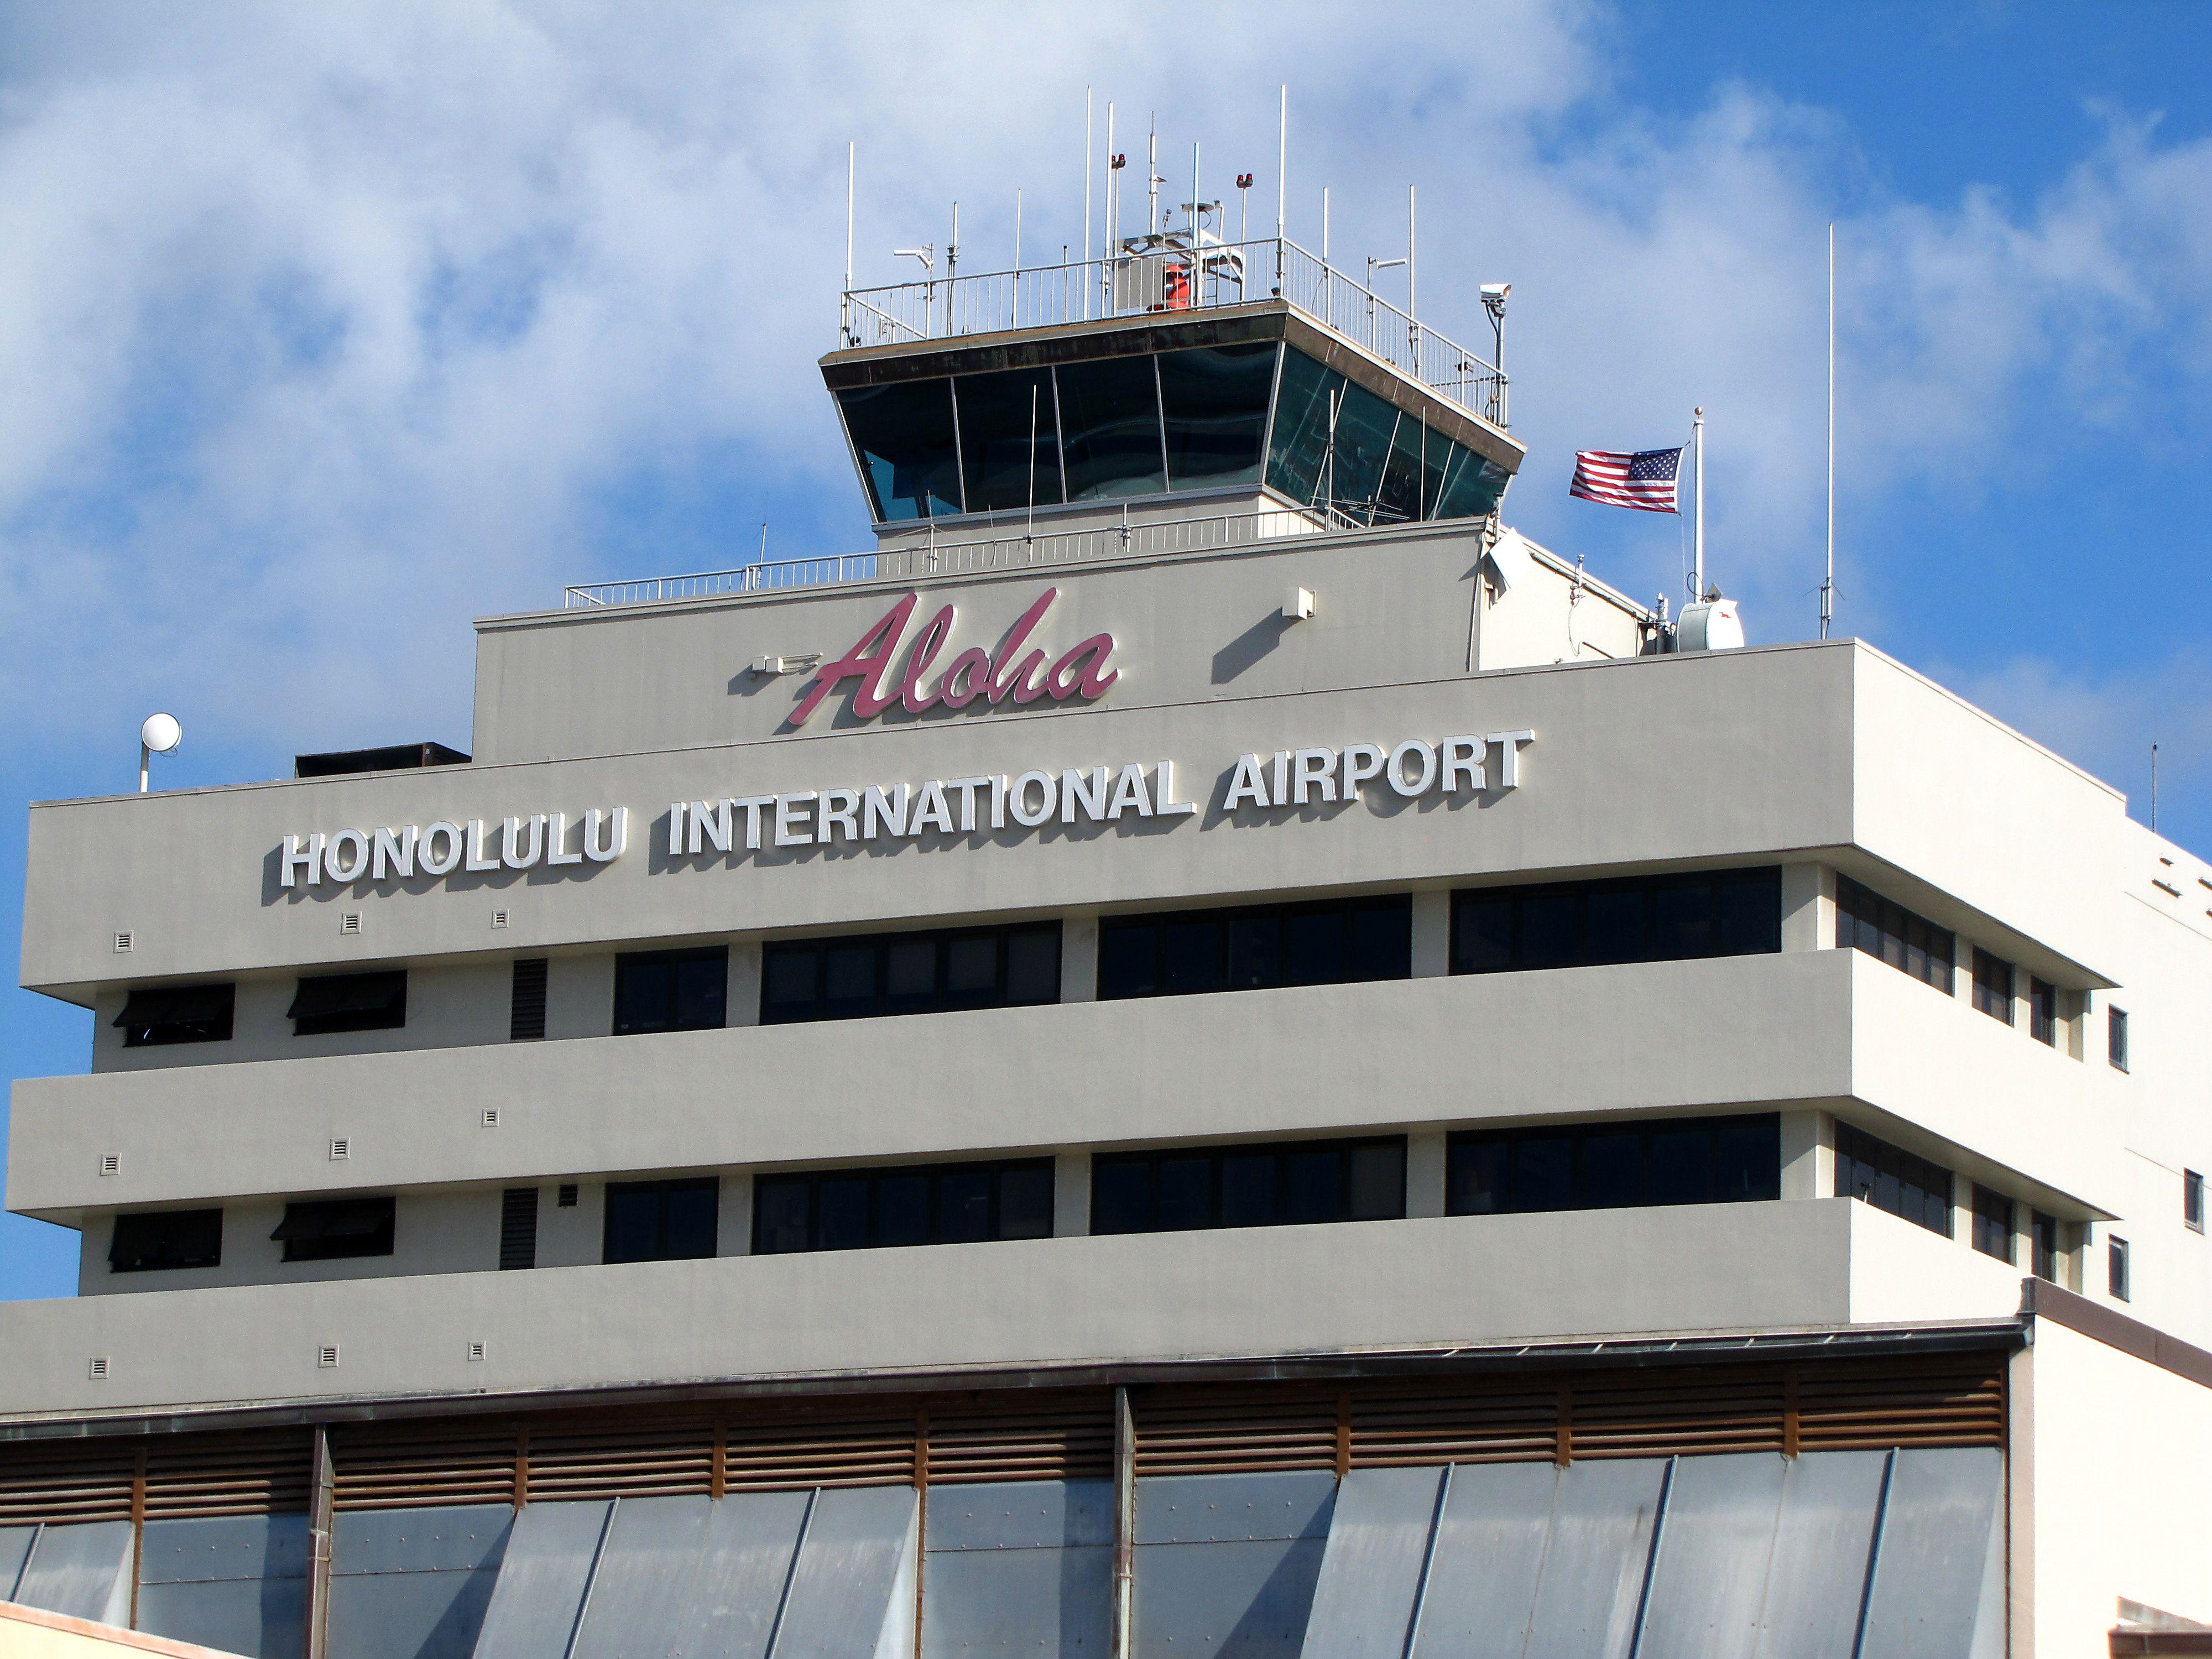 Honolulu_International_Airport_(6932471711)